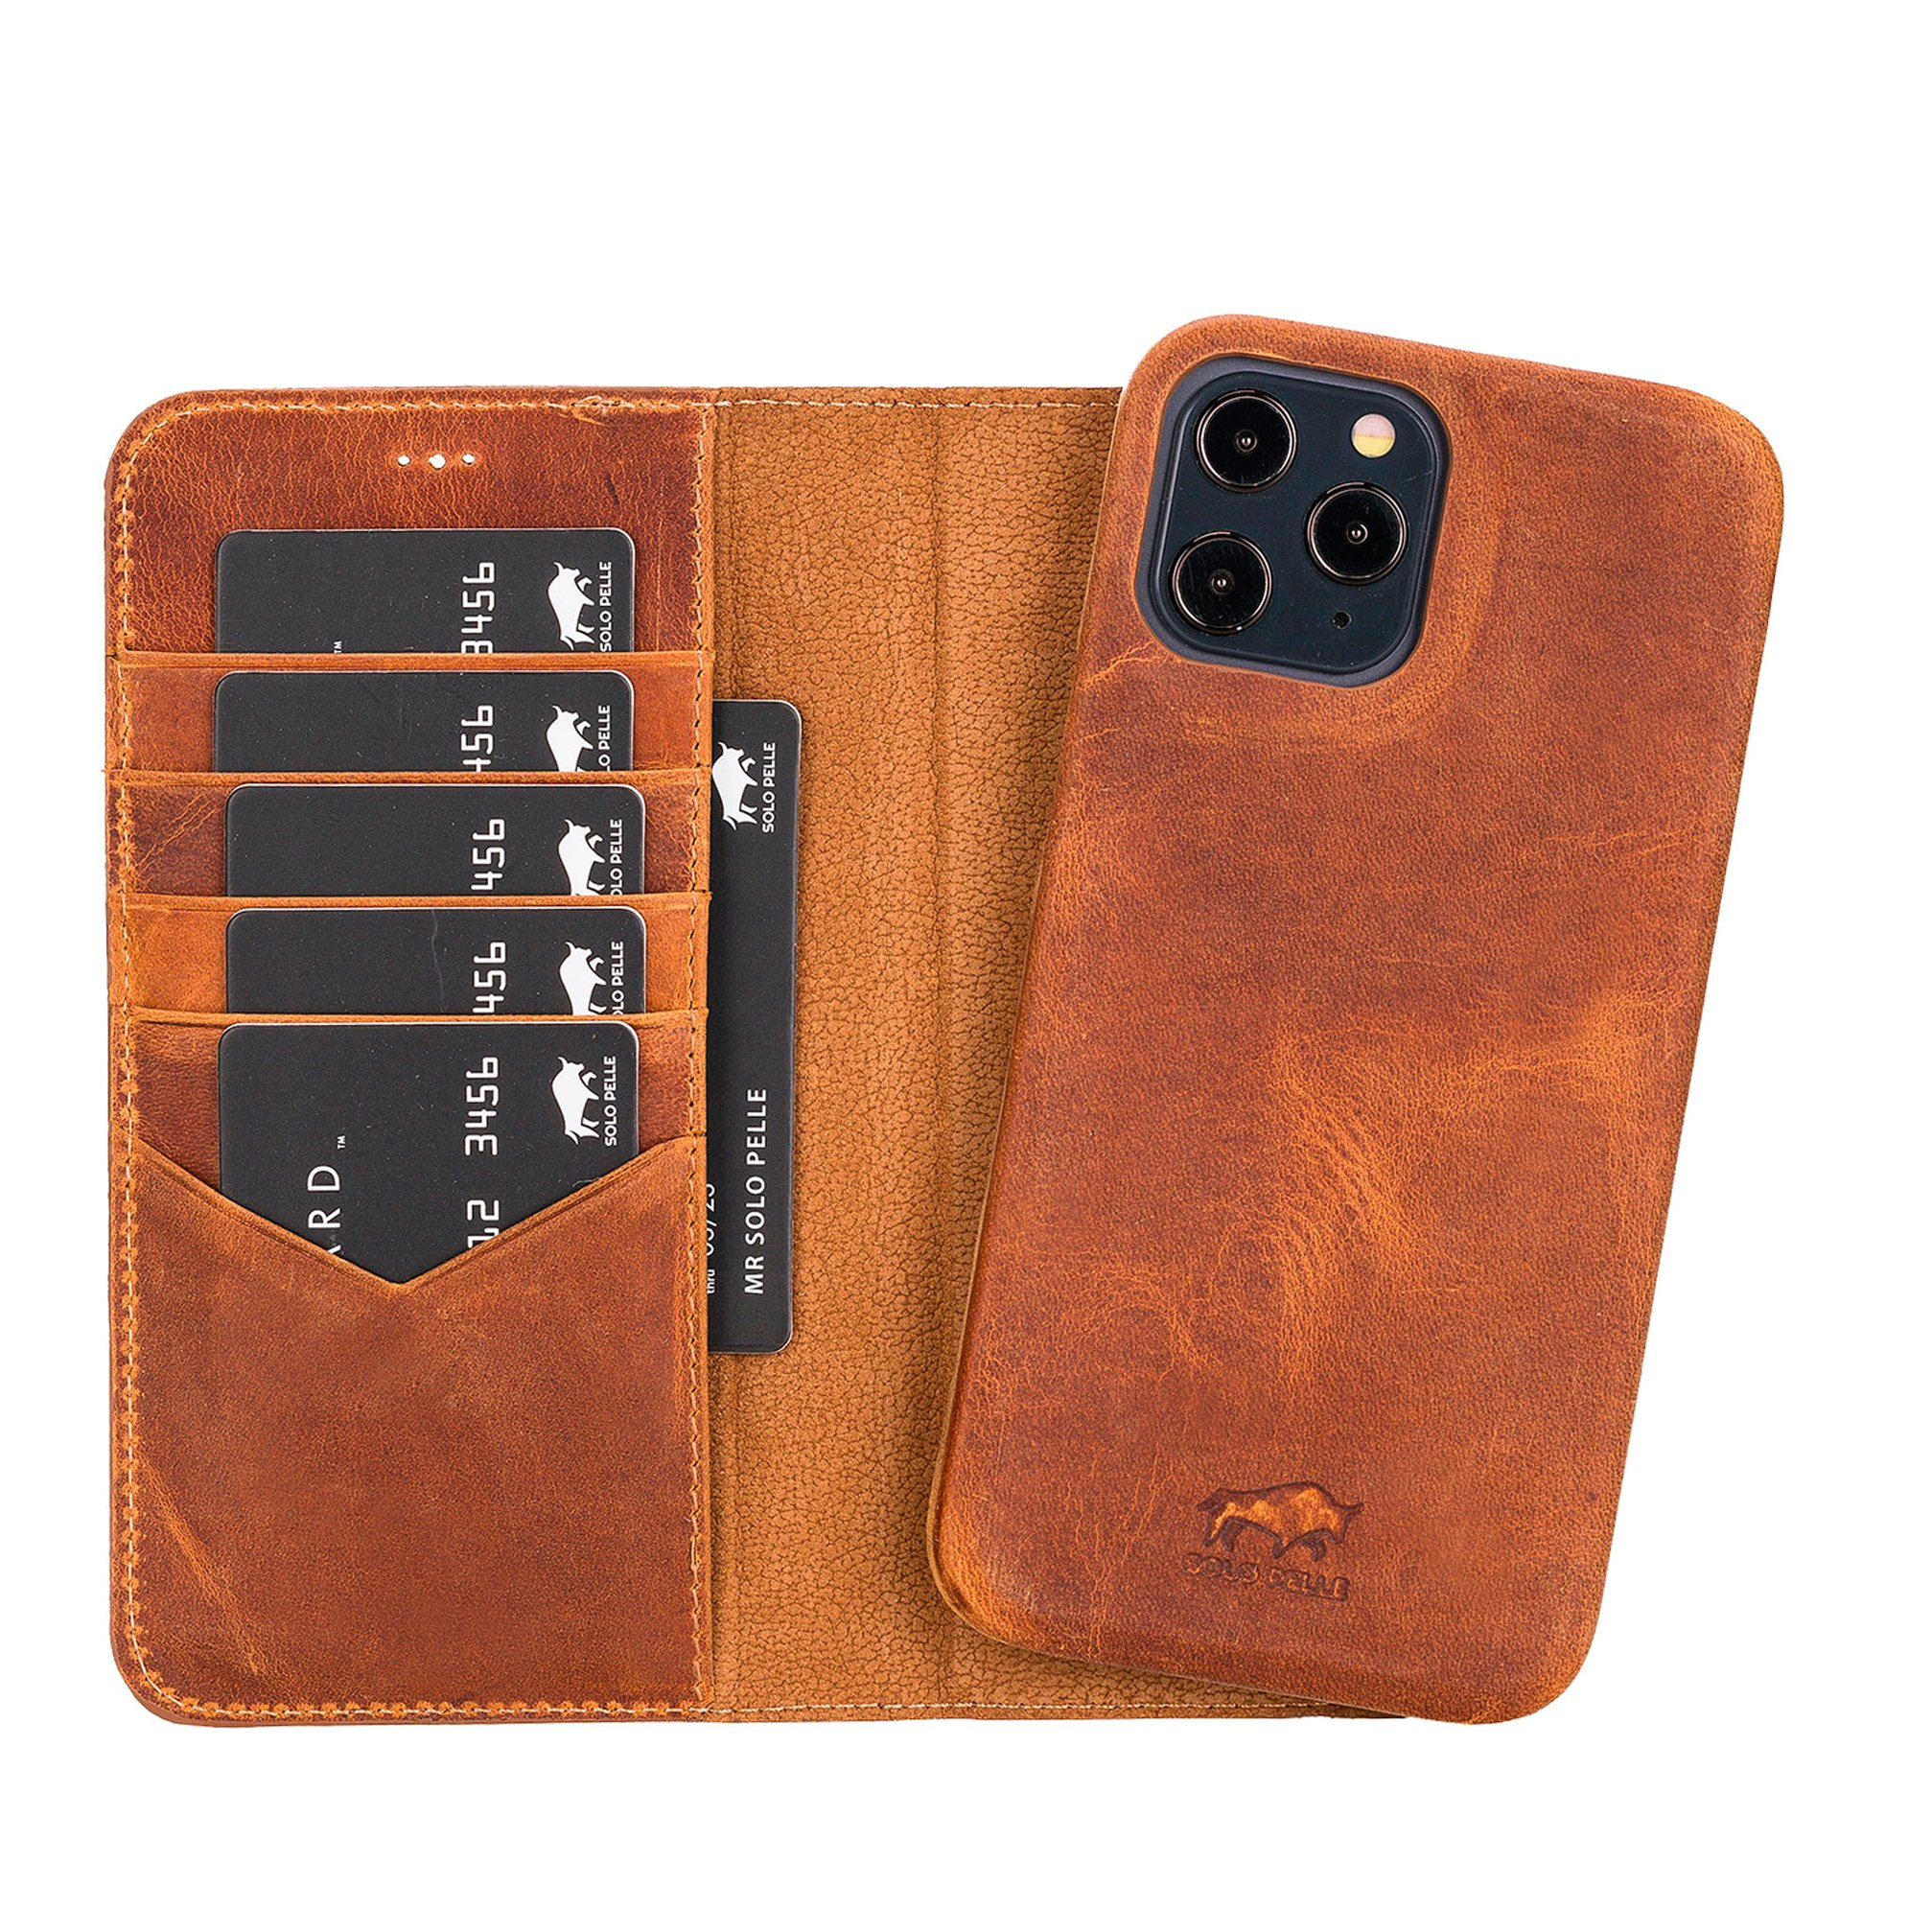 "iPhone 12 & 12 Pro abnehmbare Lederhülle ""Clemson"" MagSafe kompatibel (Vollleder Camel Braun)"